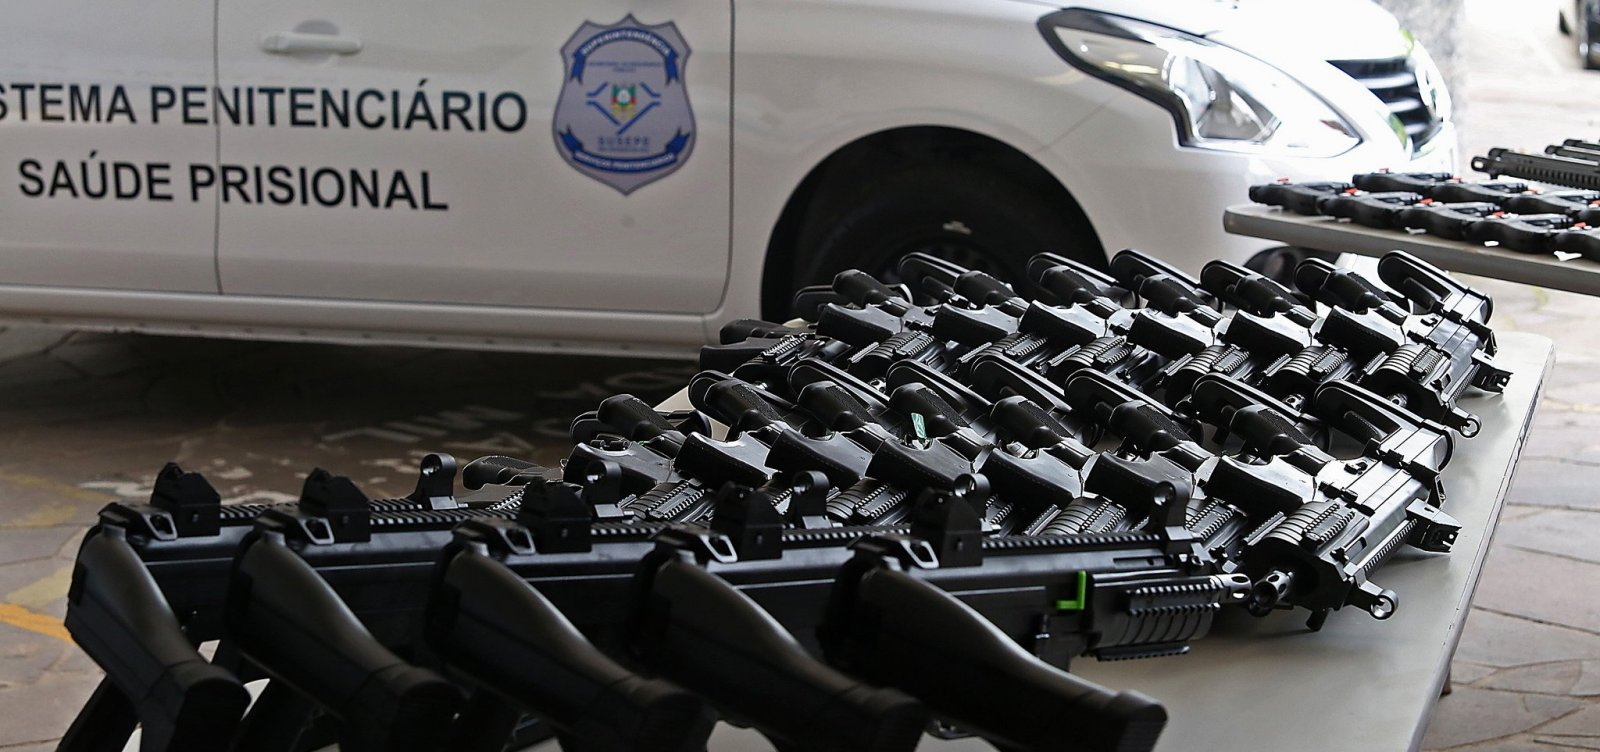 Novos fabricantes de armas se preparam para entrar no mercado brasileiro